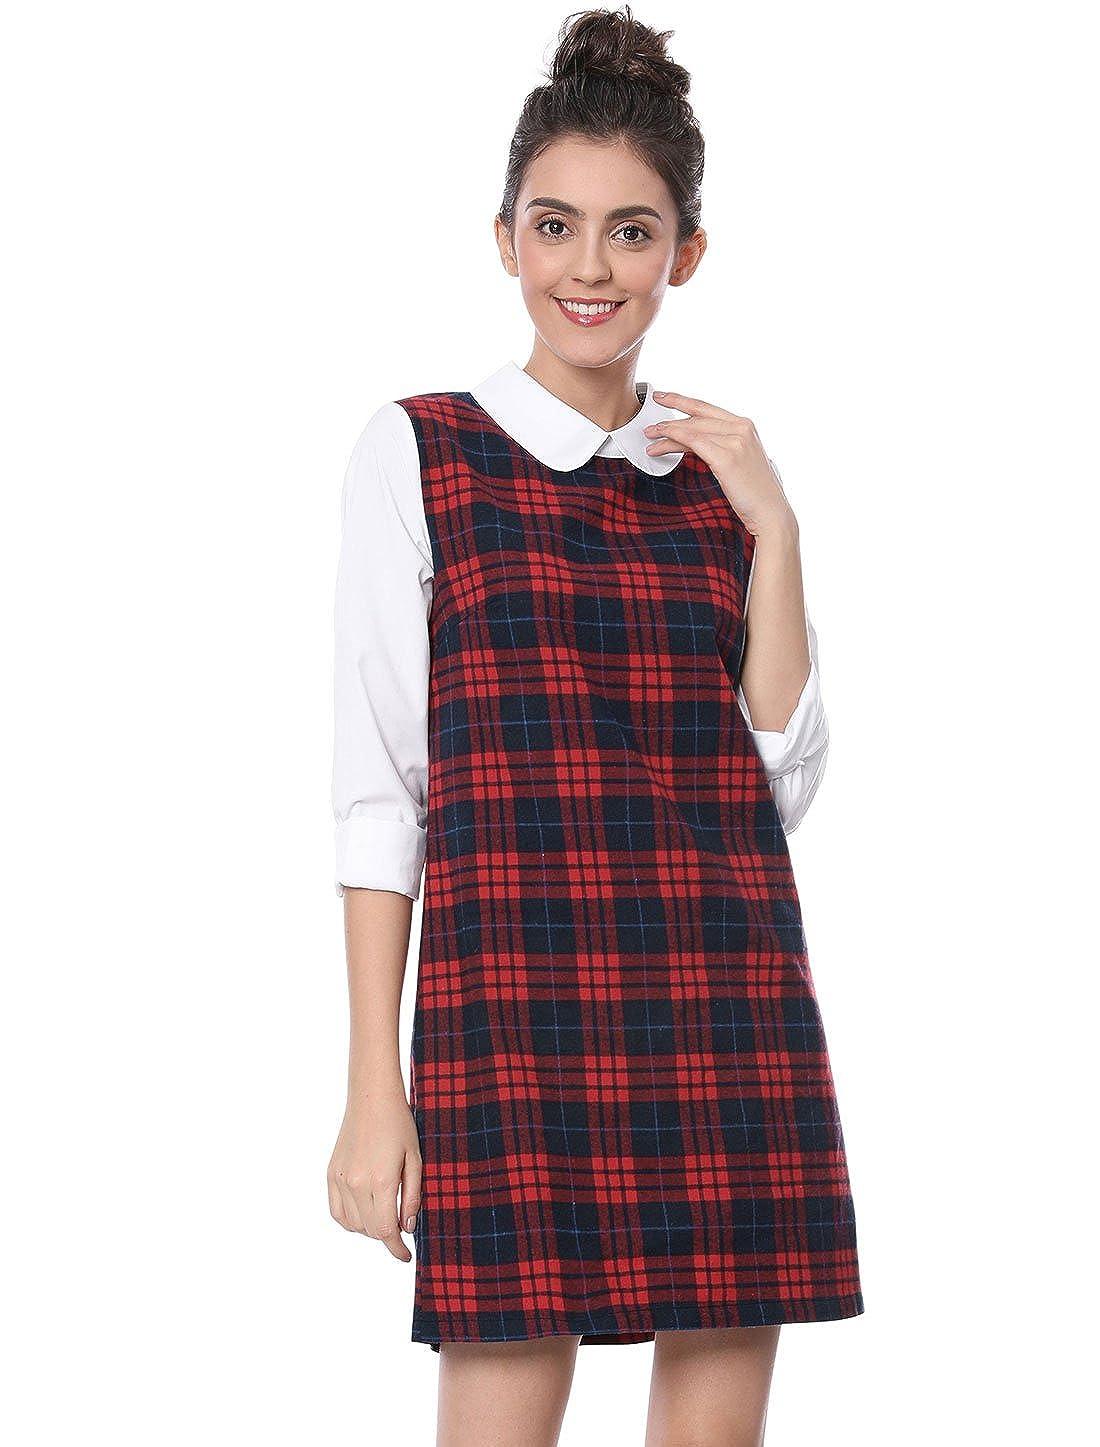 1960s Dresses | 60s Dresses Mod, Mini, Jakie O, Hippie Allegra K Womens Contrast Peter Pan Collar Long Sleeve Shift Plaid Checked Dress £20.59 AT vintagedancer.com